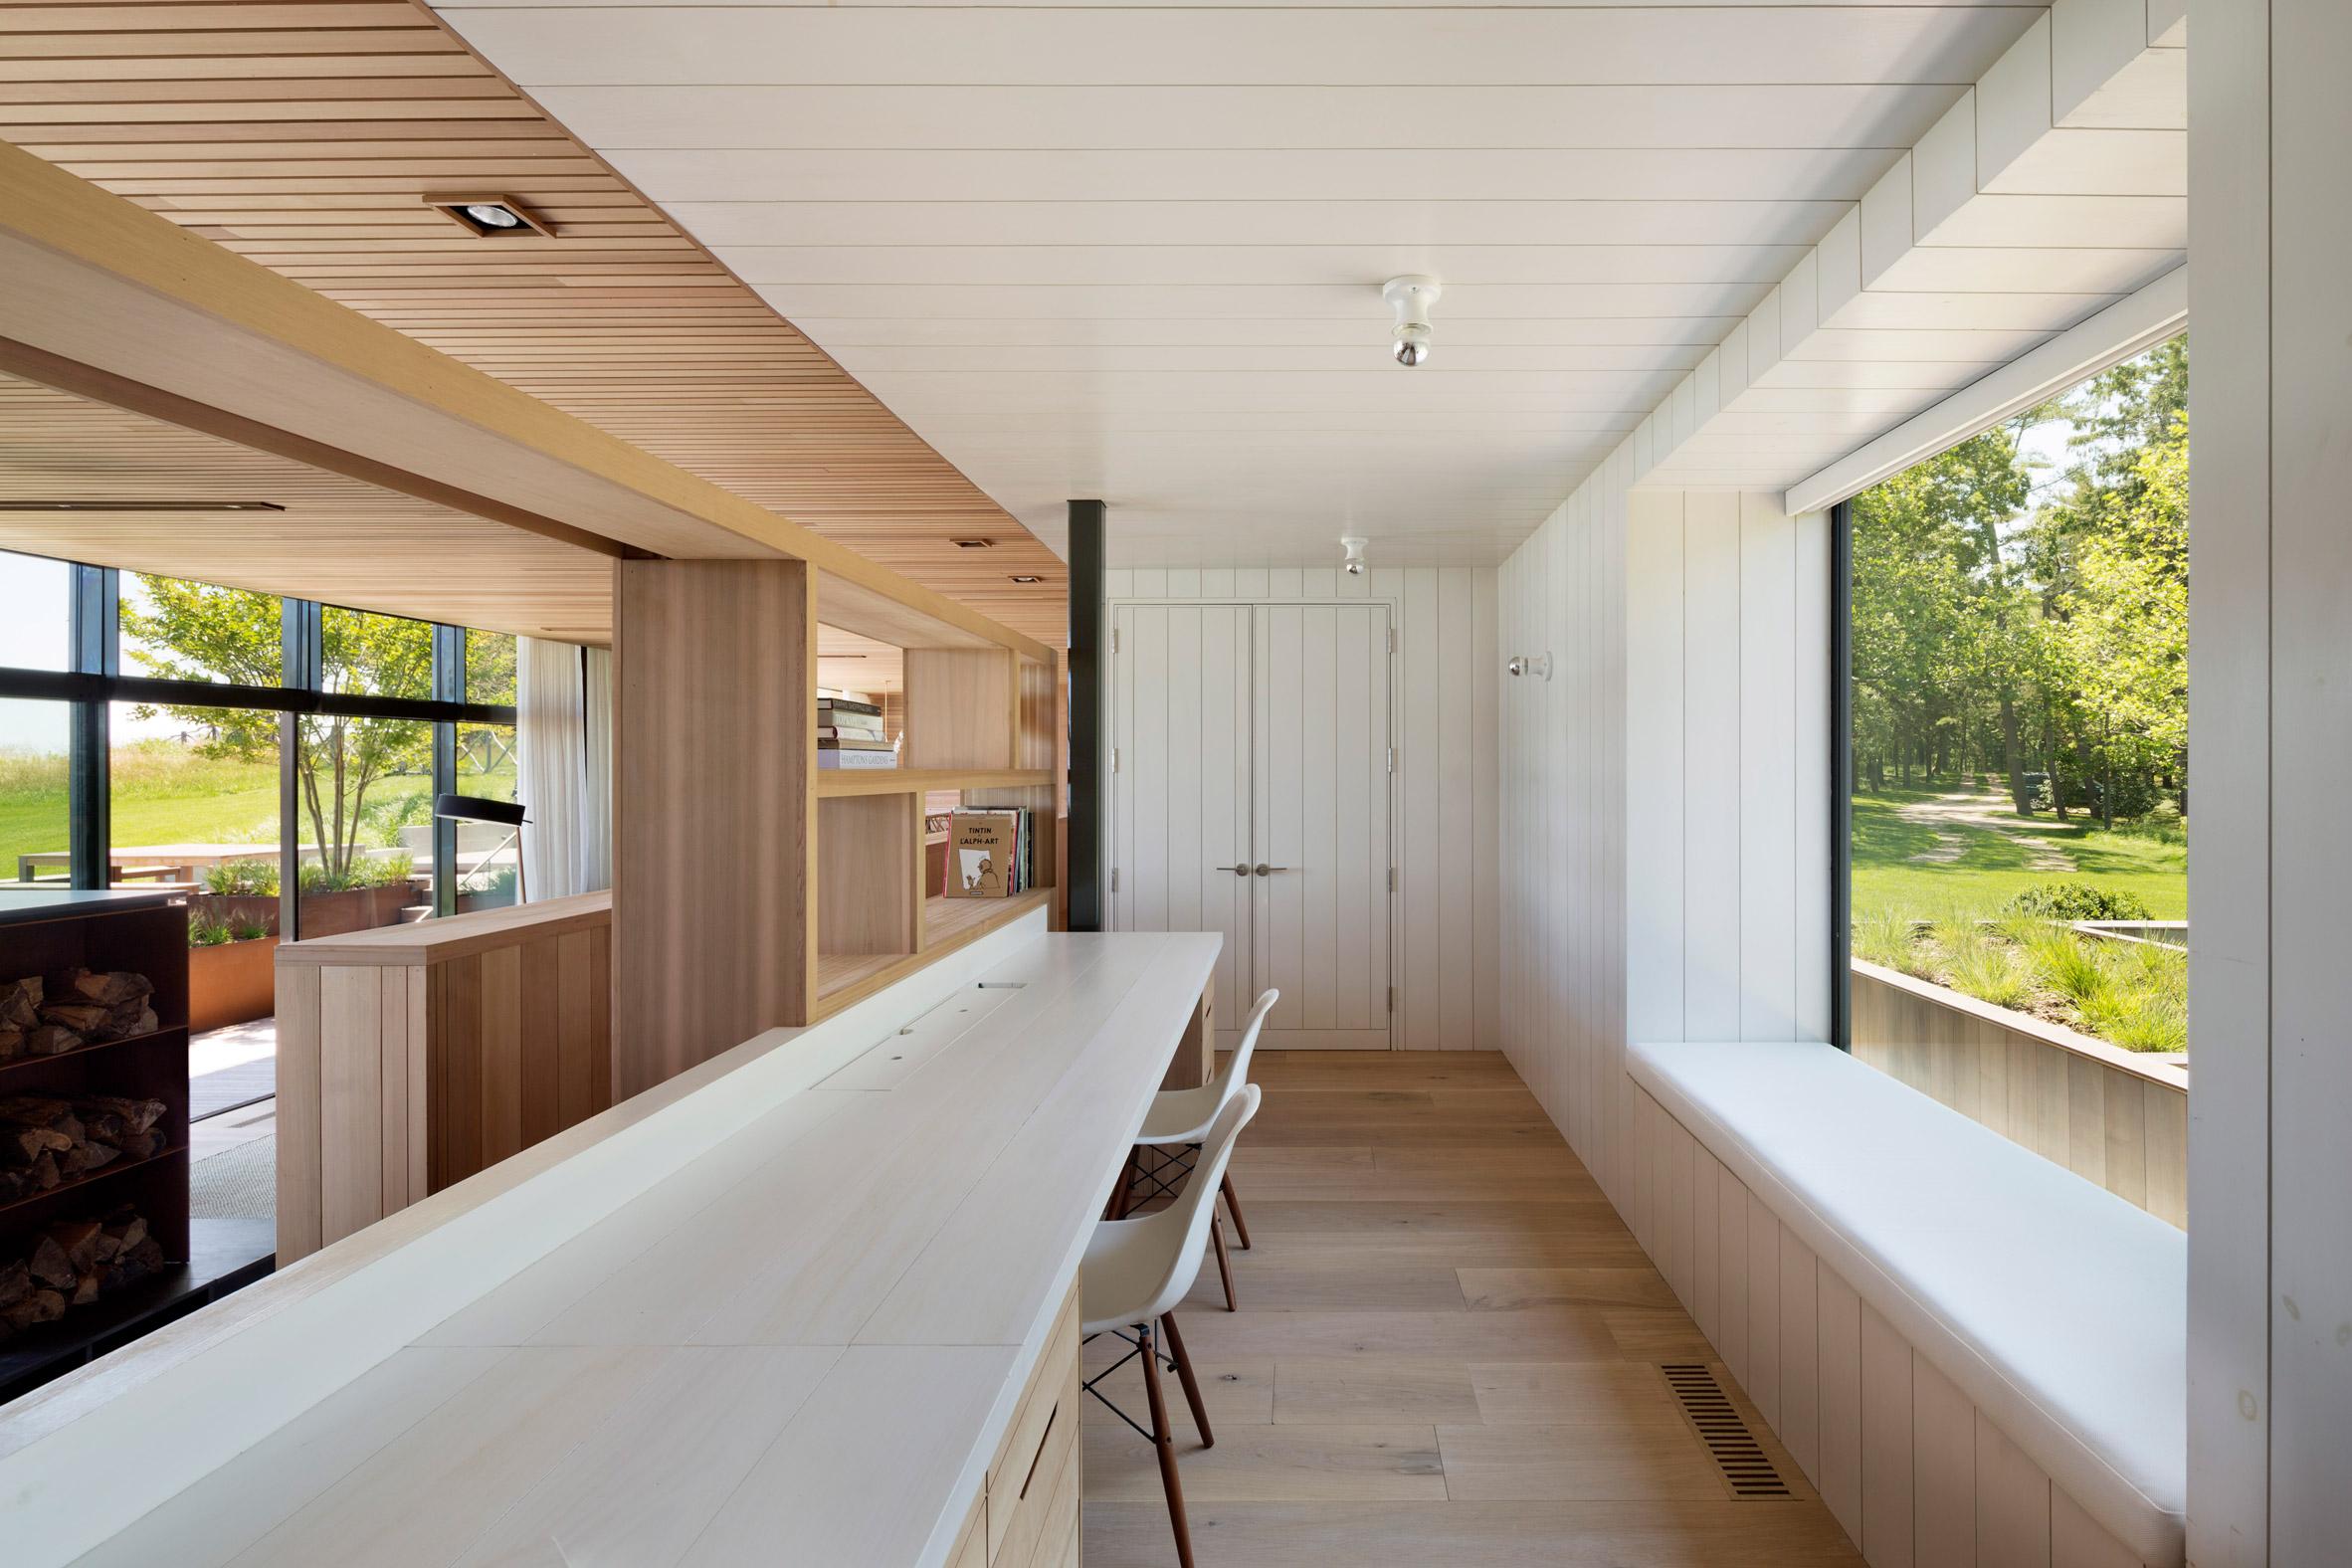 peconic-house-mapos-studio-hamptons-long-island-new-york_dezeen_2364_col_23.jpg